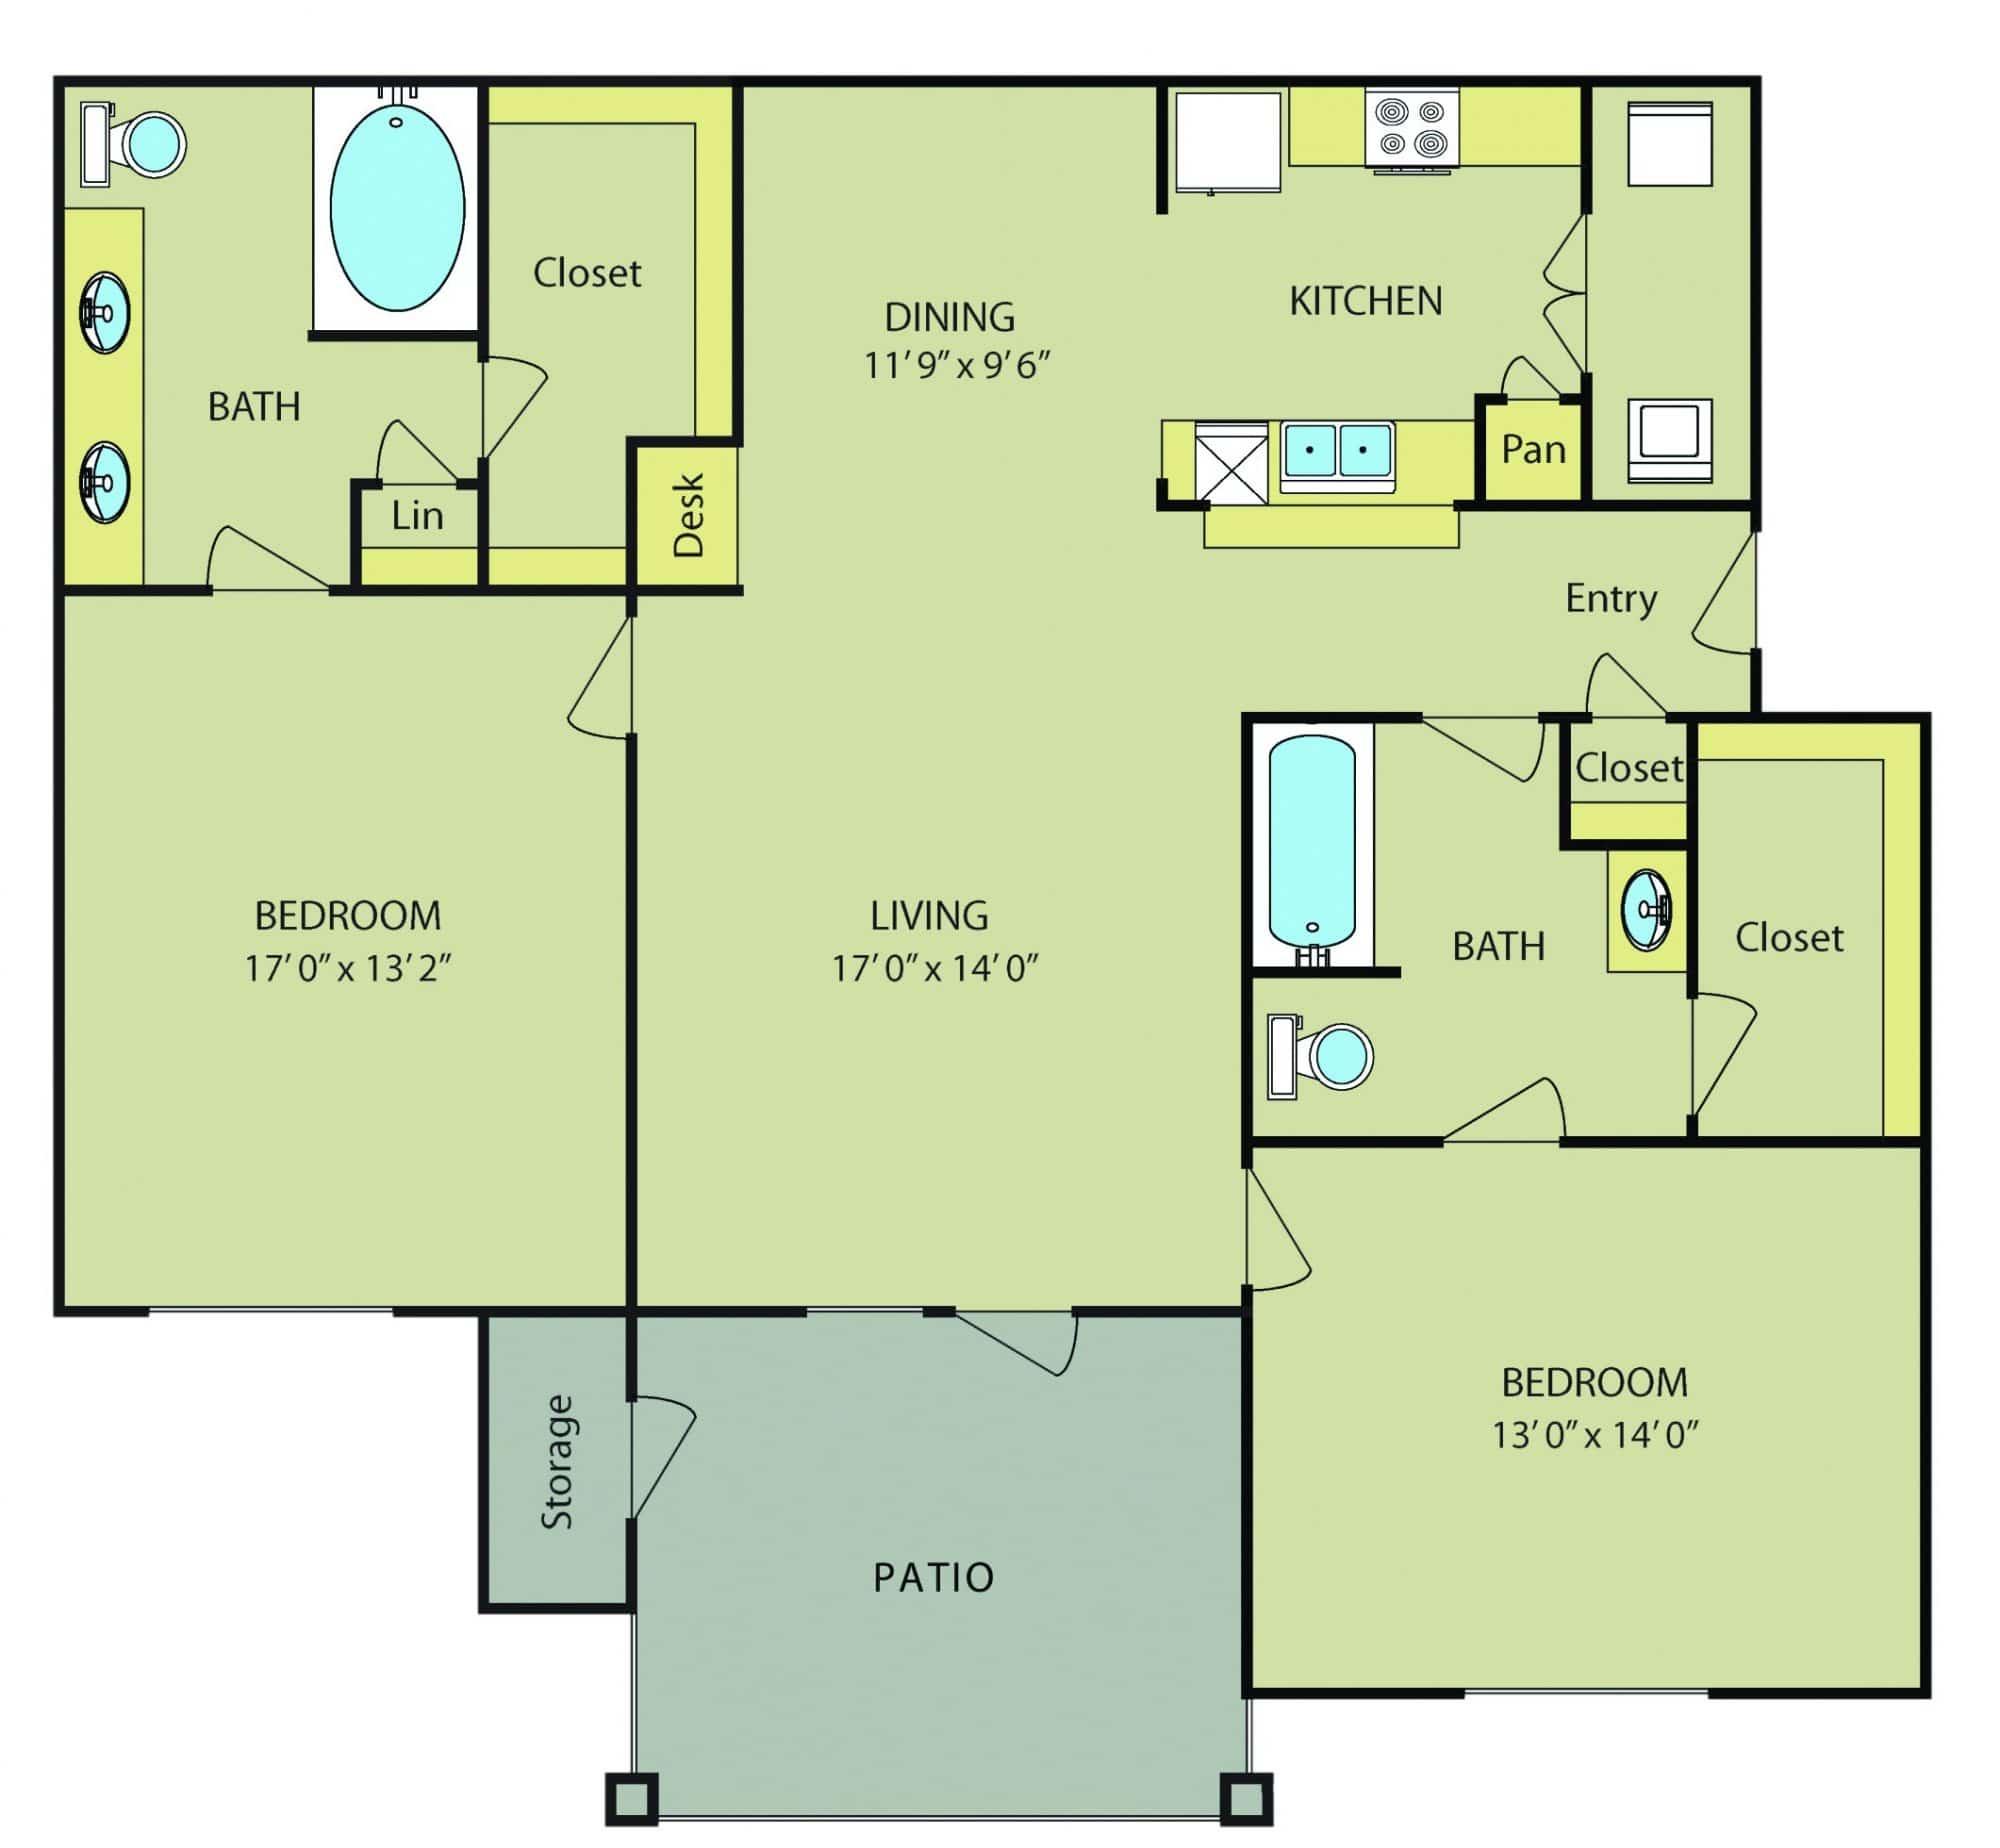 Apartments For Rent Near San Francisco Airport: Palomino Apartments In San Antonio, Texas